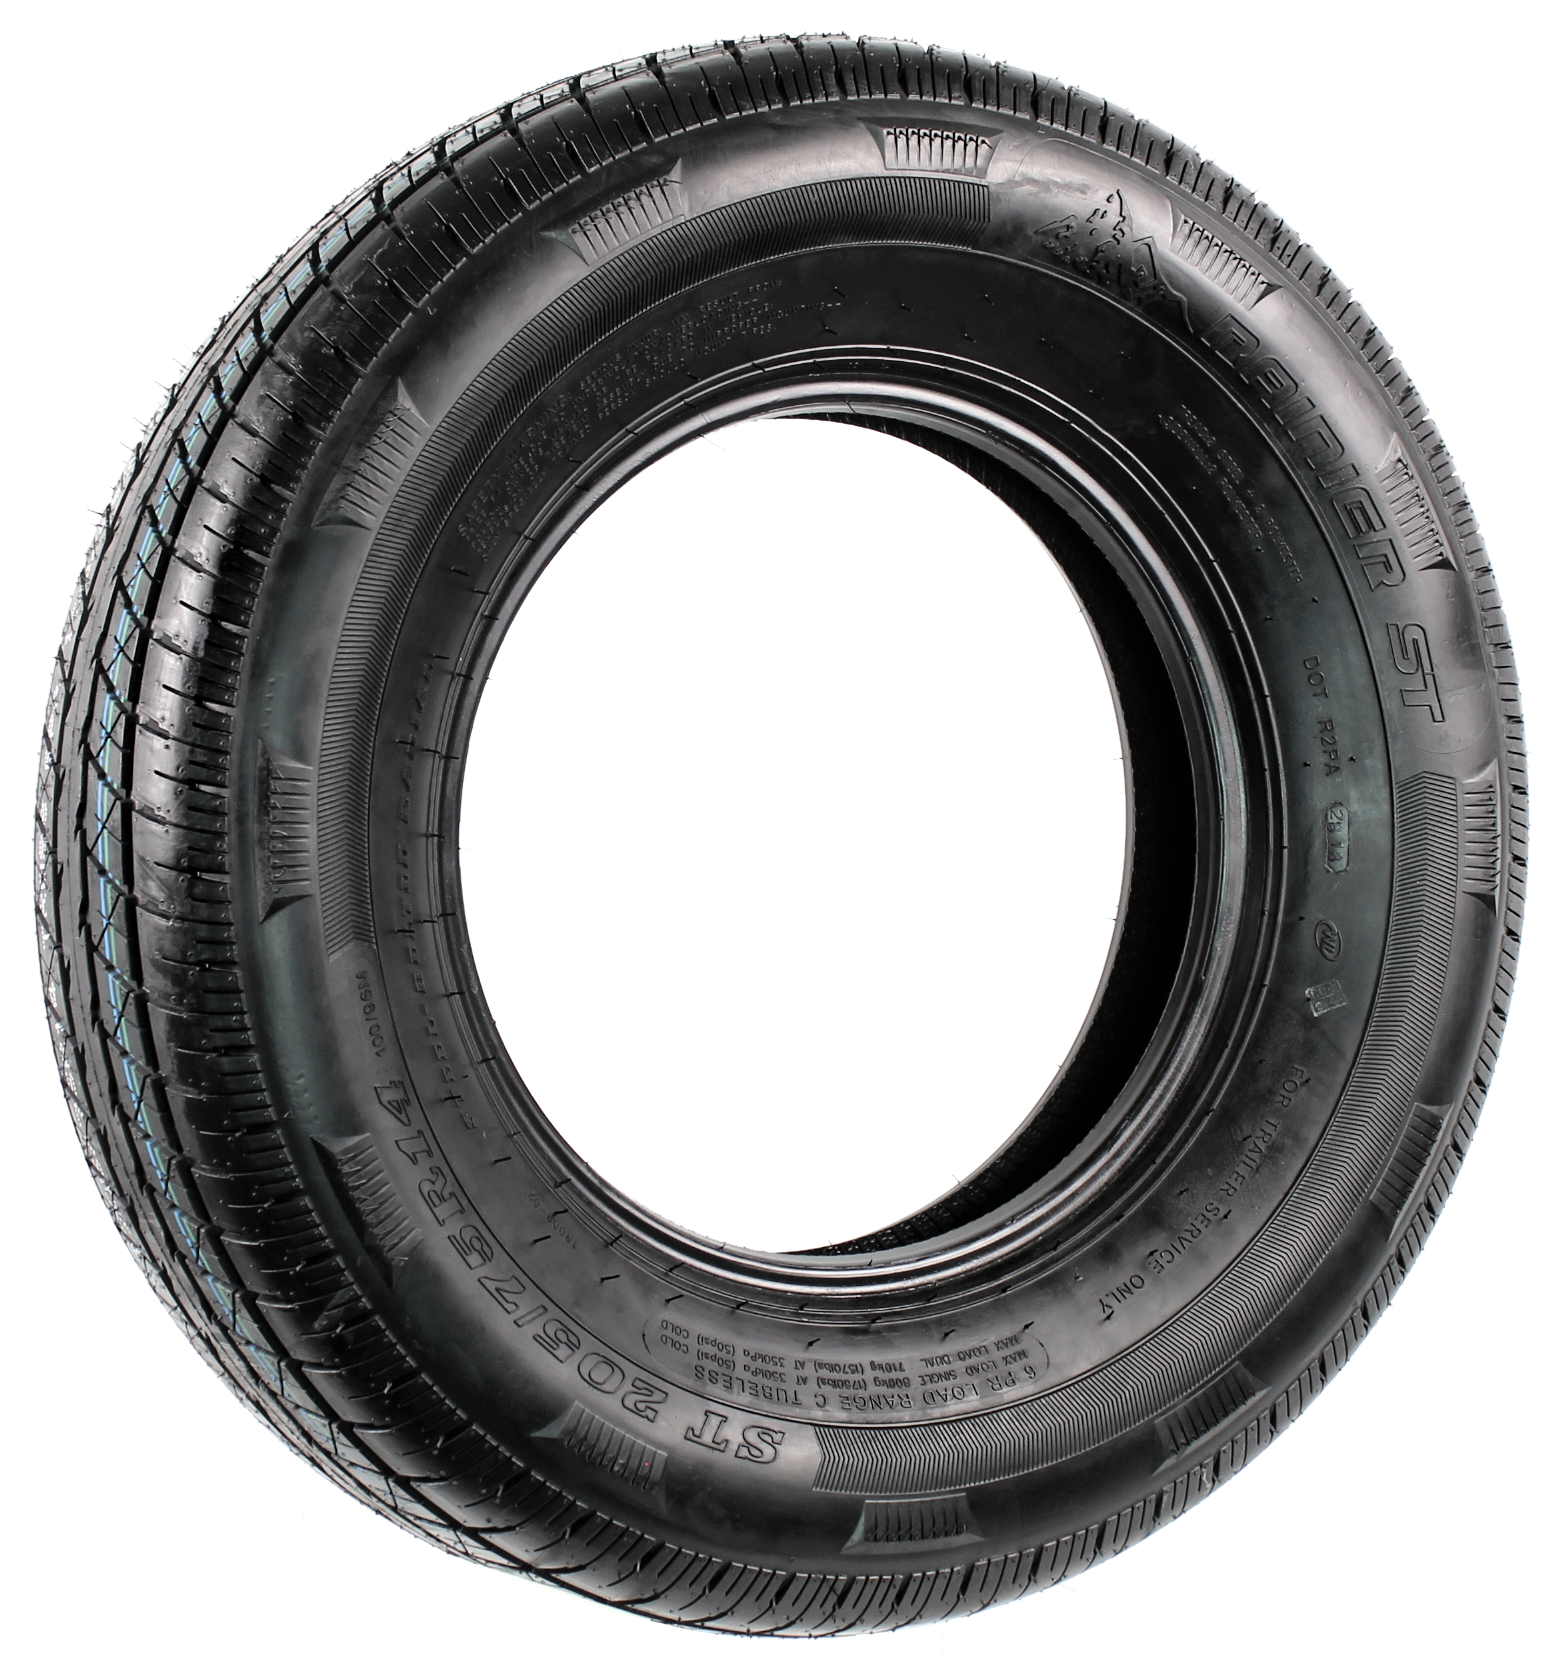 Rainier ST205/75R14 LRC 6-Ply Radial Trailer Tire Image